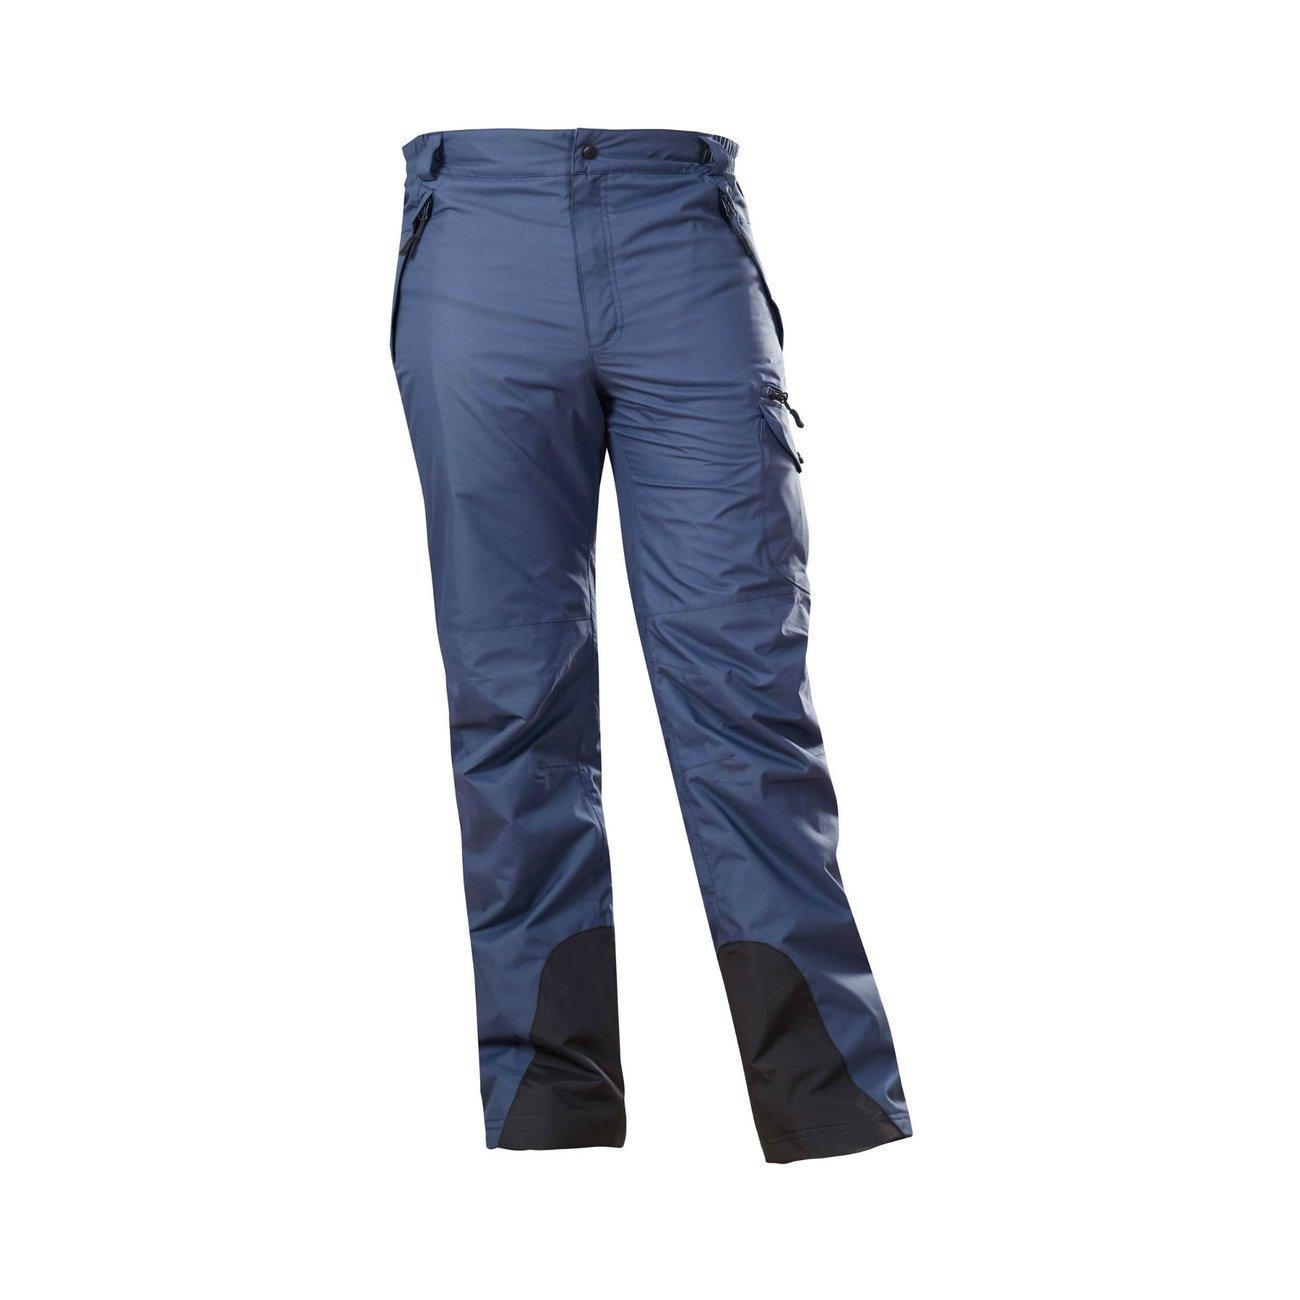 Owney Outdoor Herrenhose YUKON Pants, Bild 3